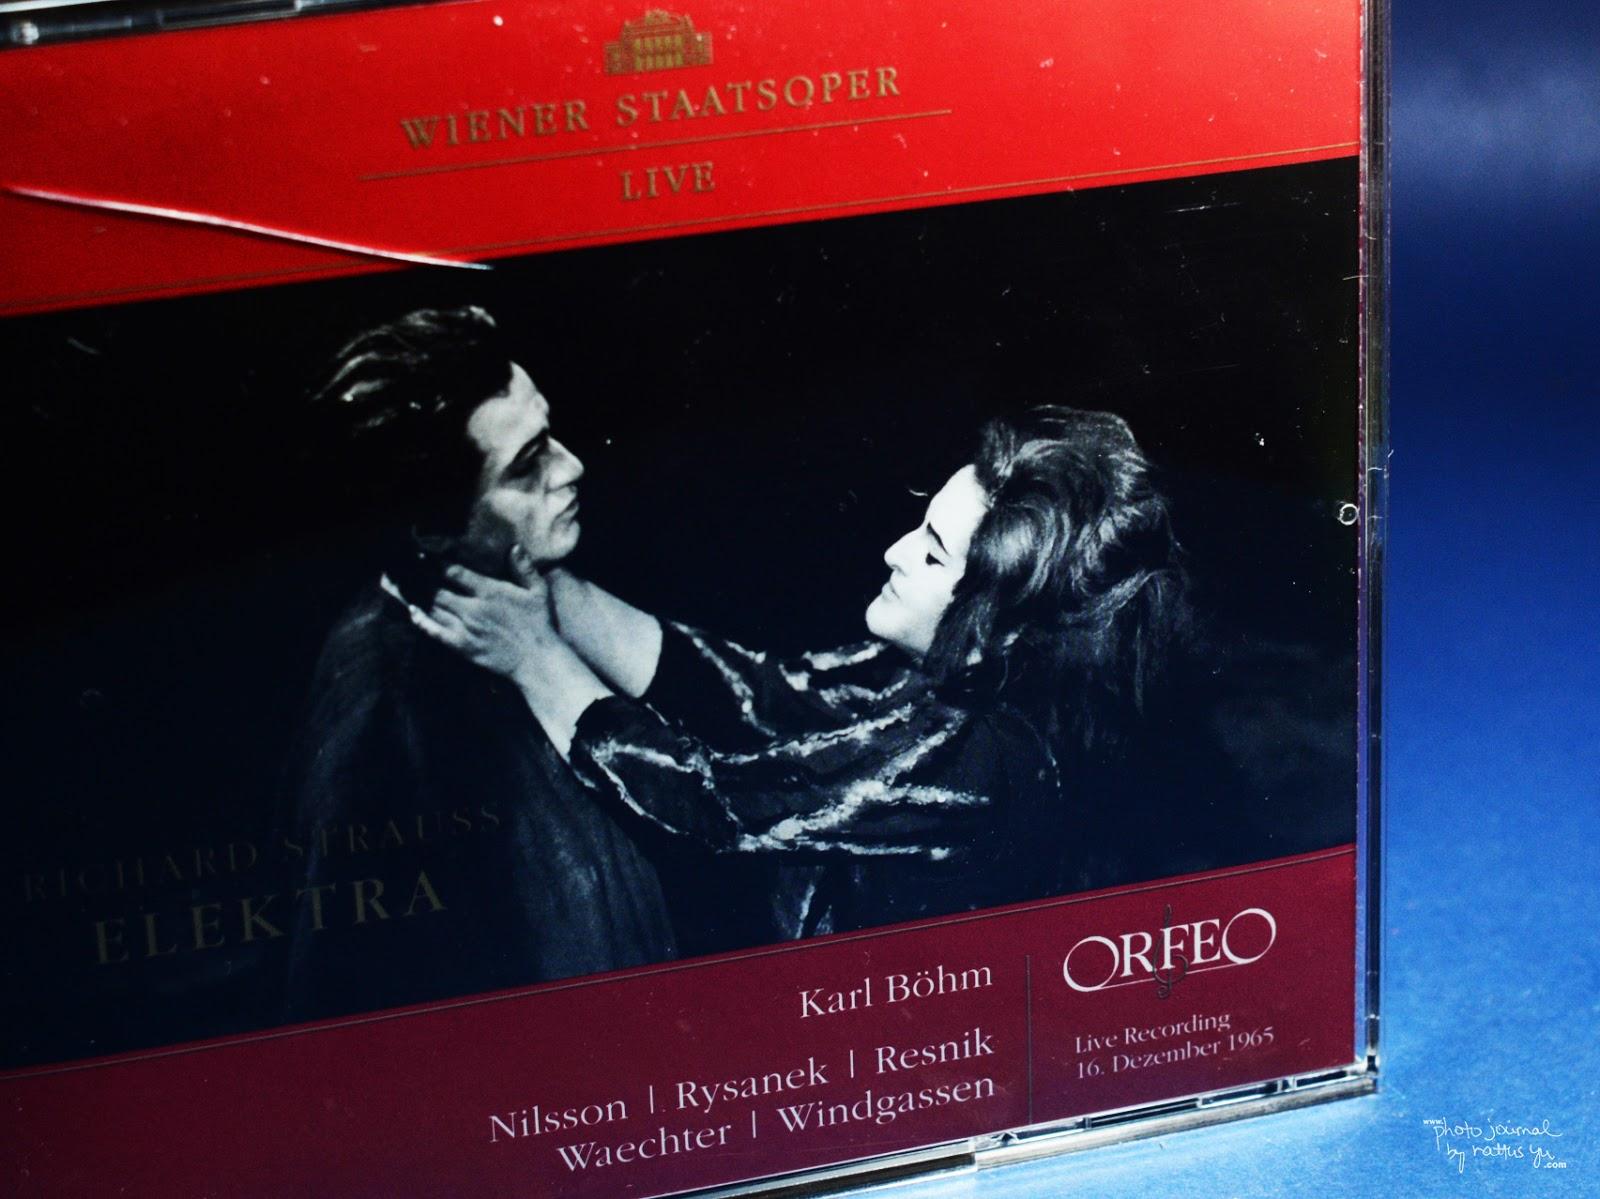 UNBOXING: Richard Strauss' ELEKTRA, Live Recording from Vienna (1965)